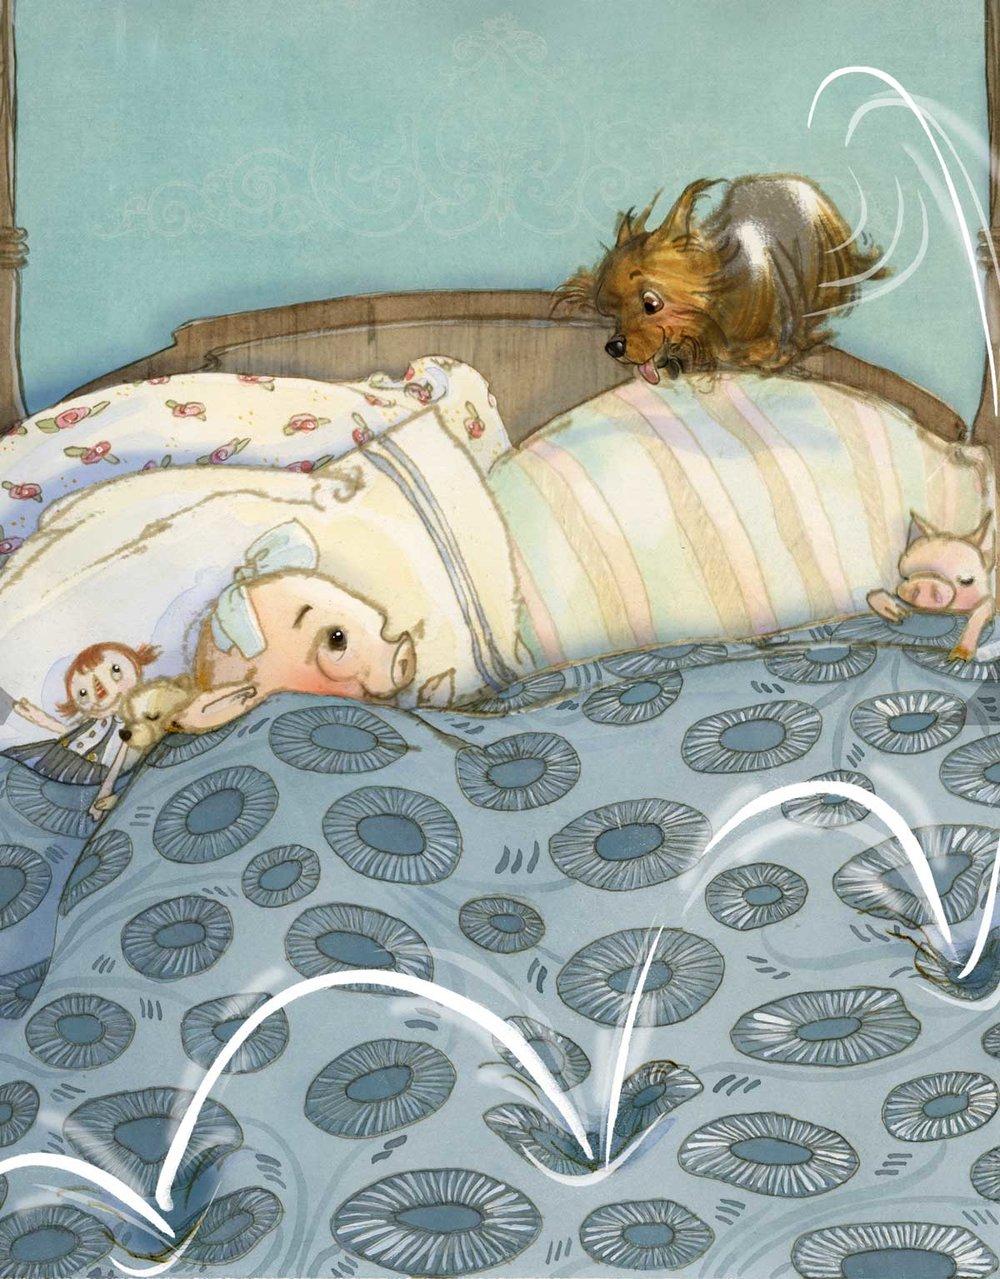 Charl-pixie-bed-colour-comp-ALT05-FLAT.jpg